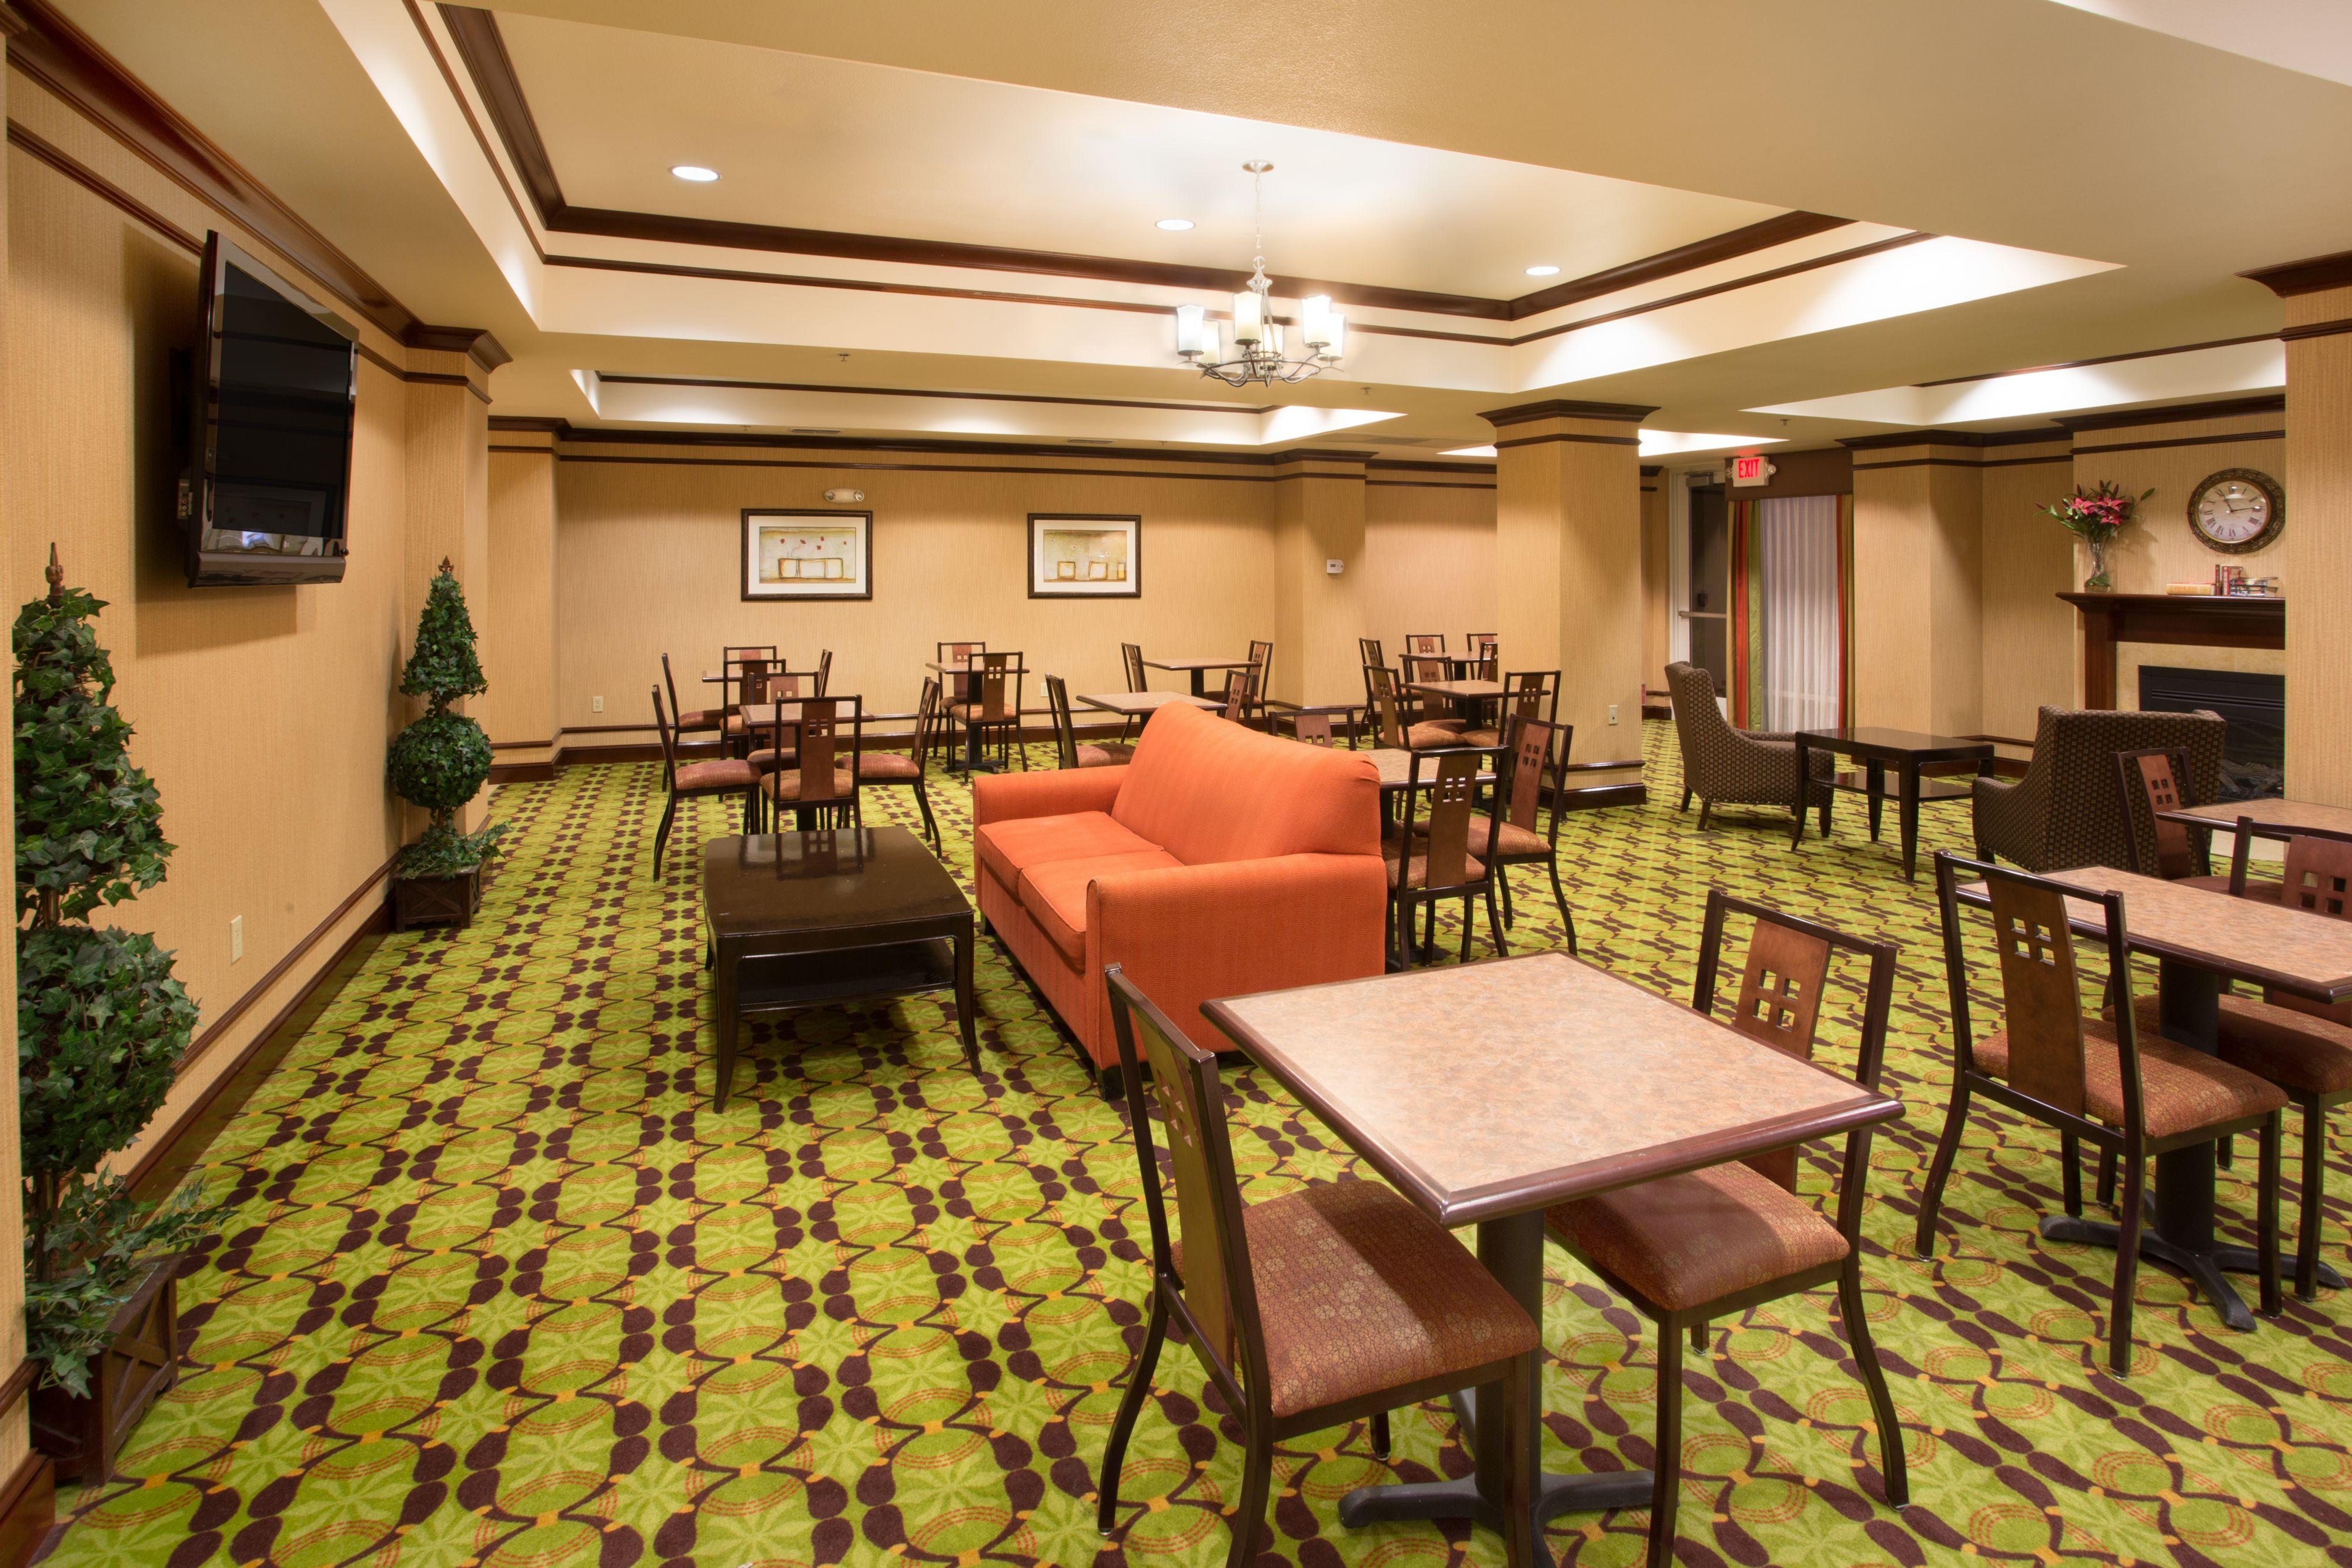 Holiday Inn Express Yreka-Shasta Area image 6